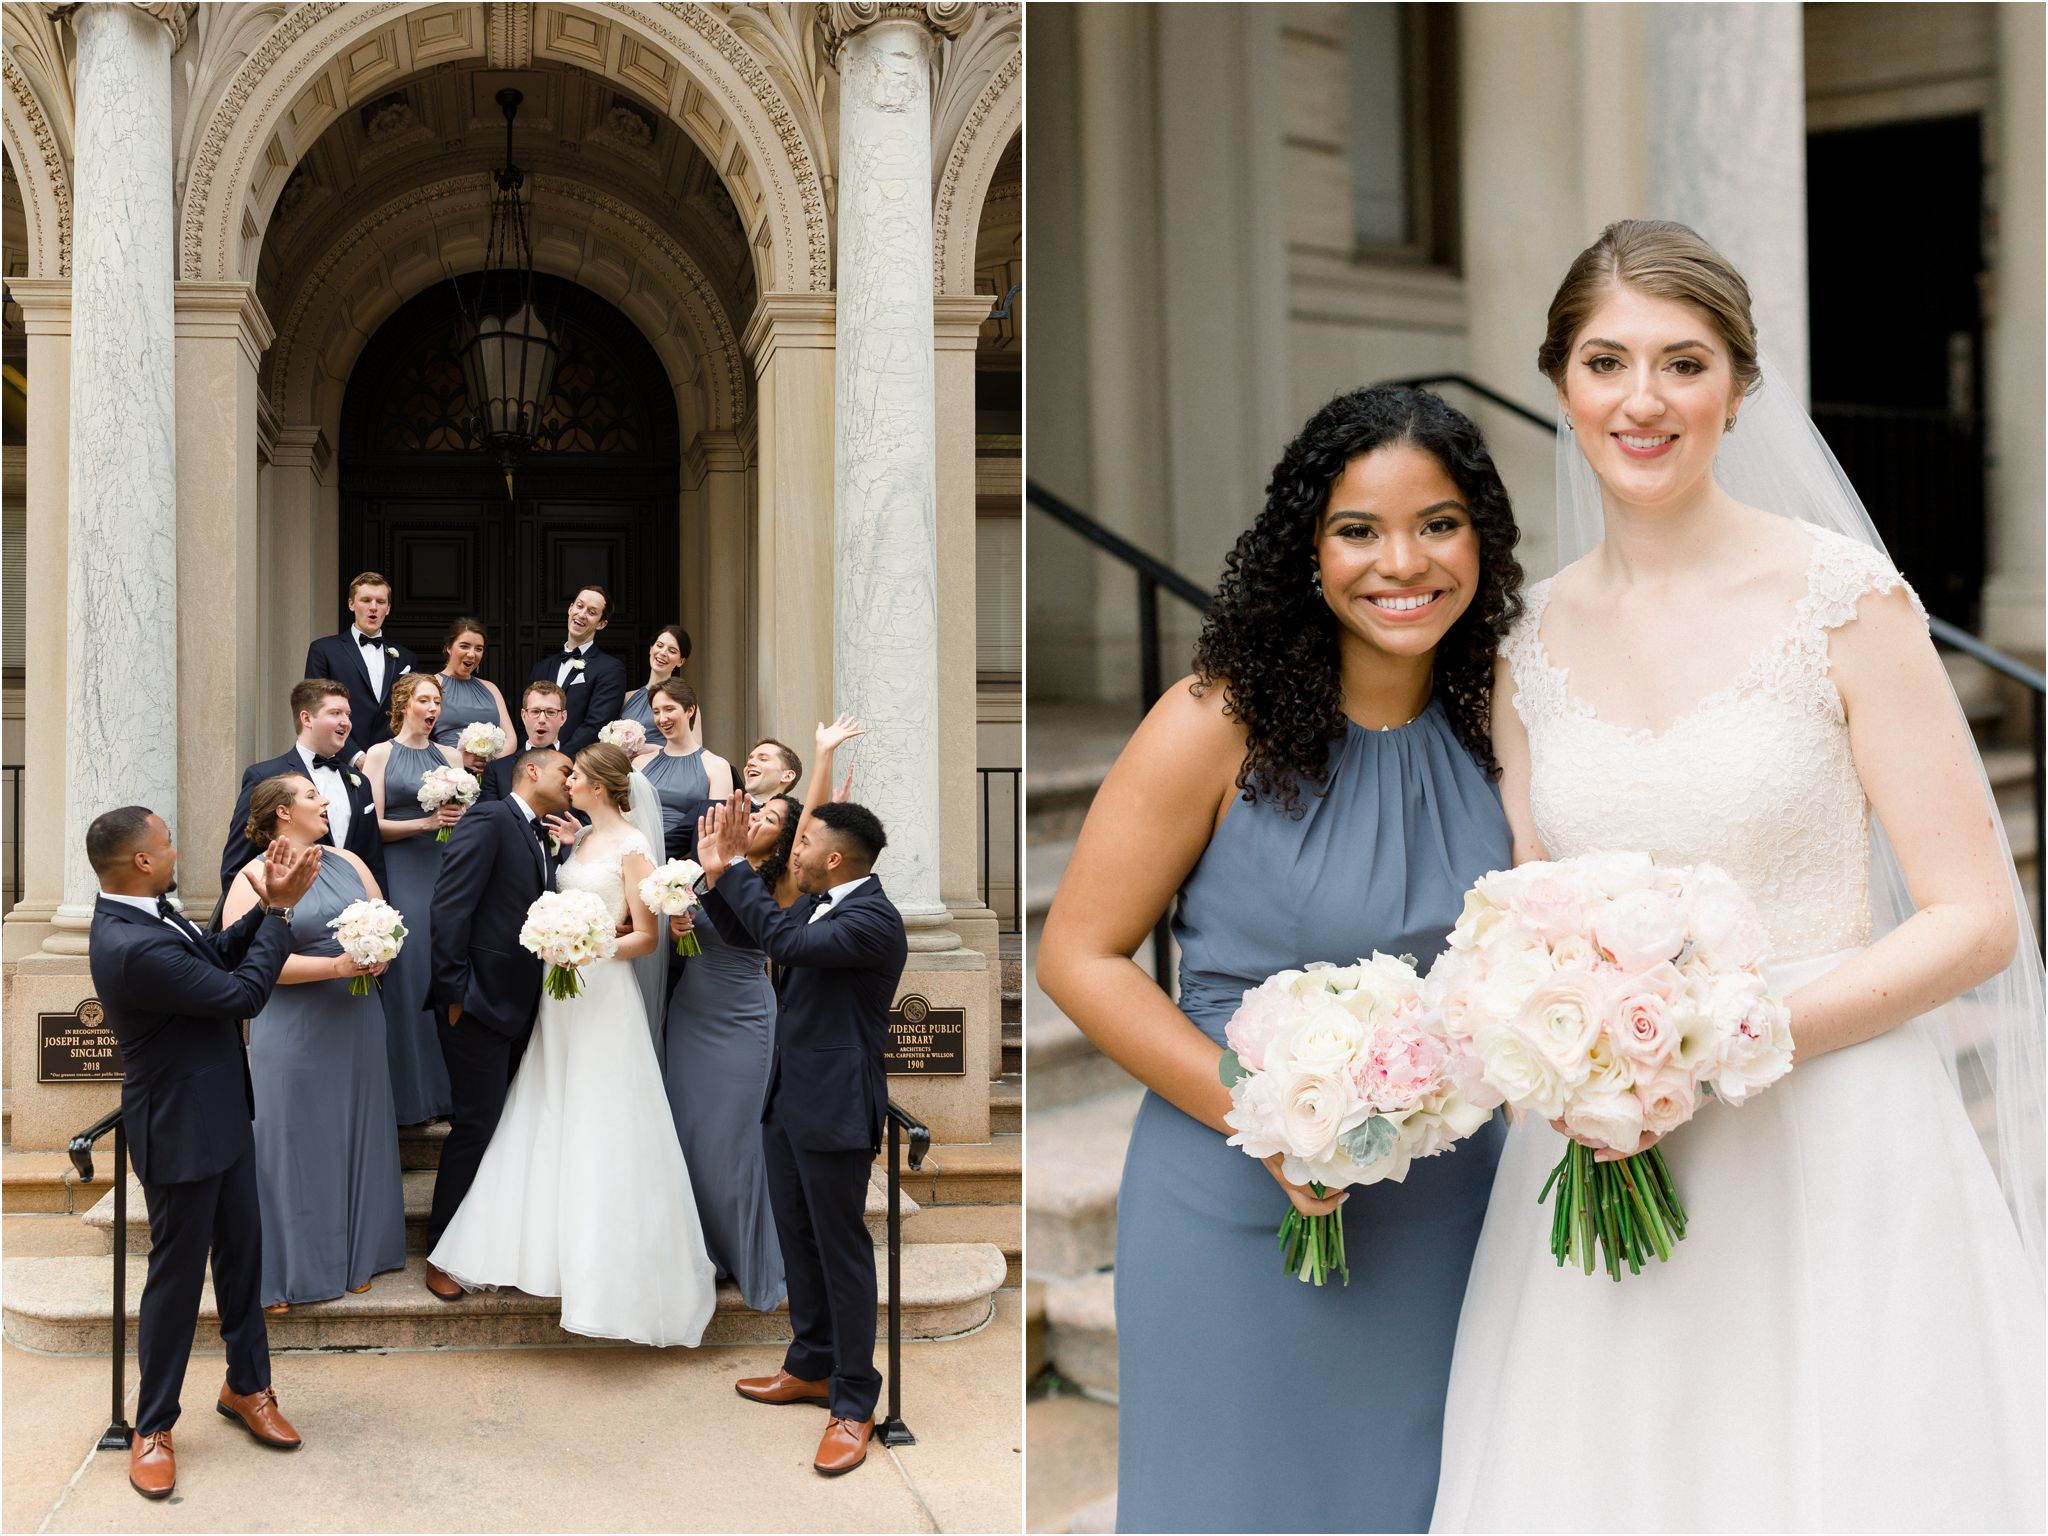 providence-public-library-wedding-images_00025.JPG